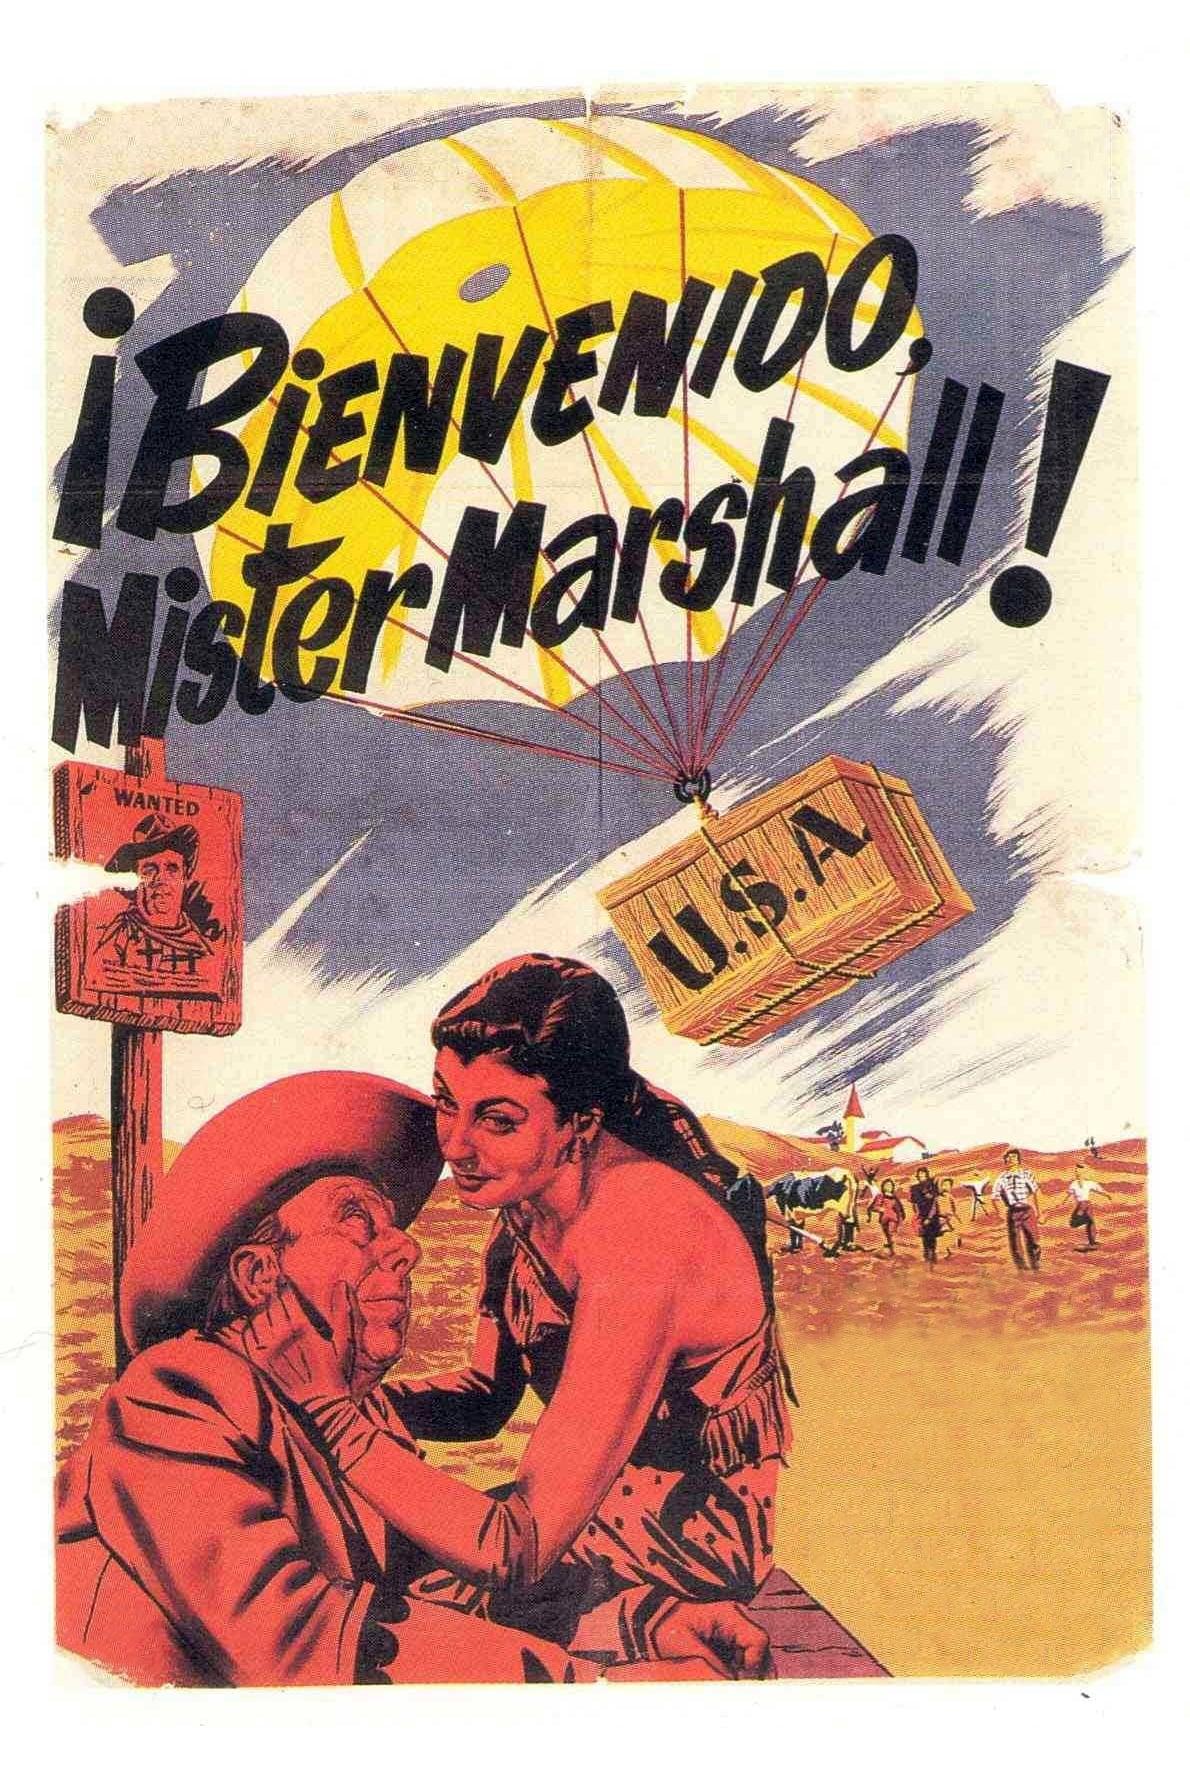 ¡Bienvenido, Míster Marshall! (1953)